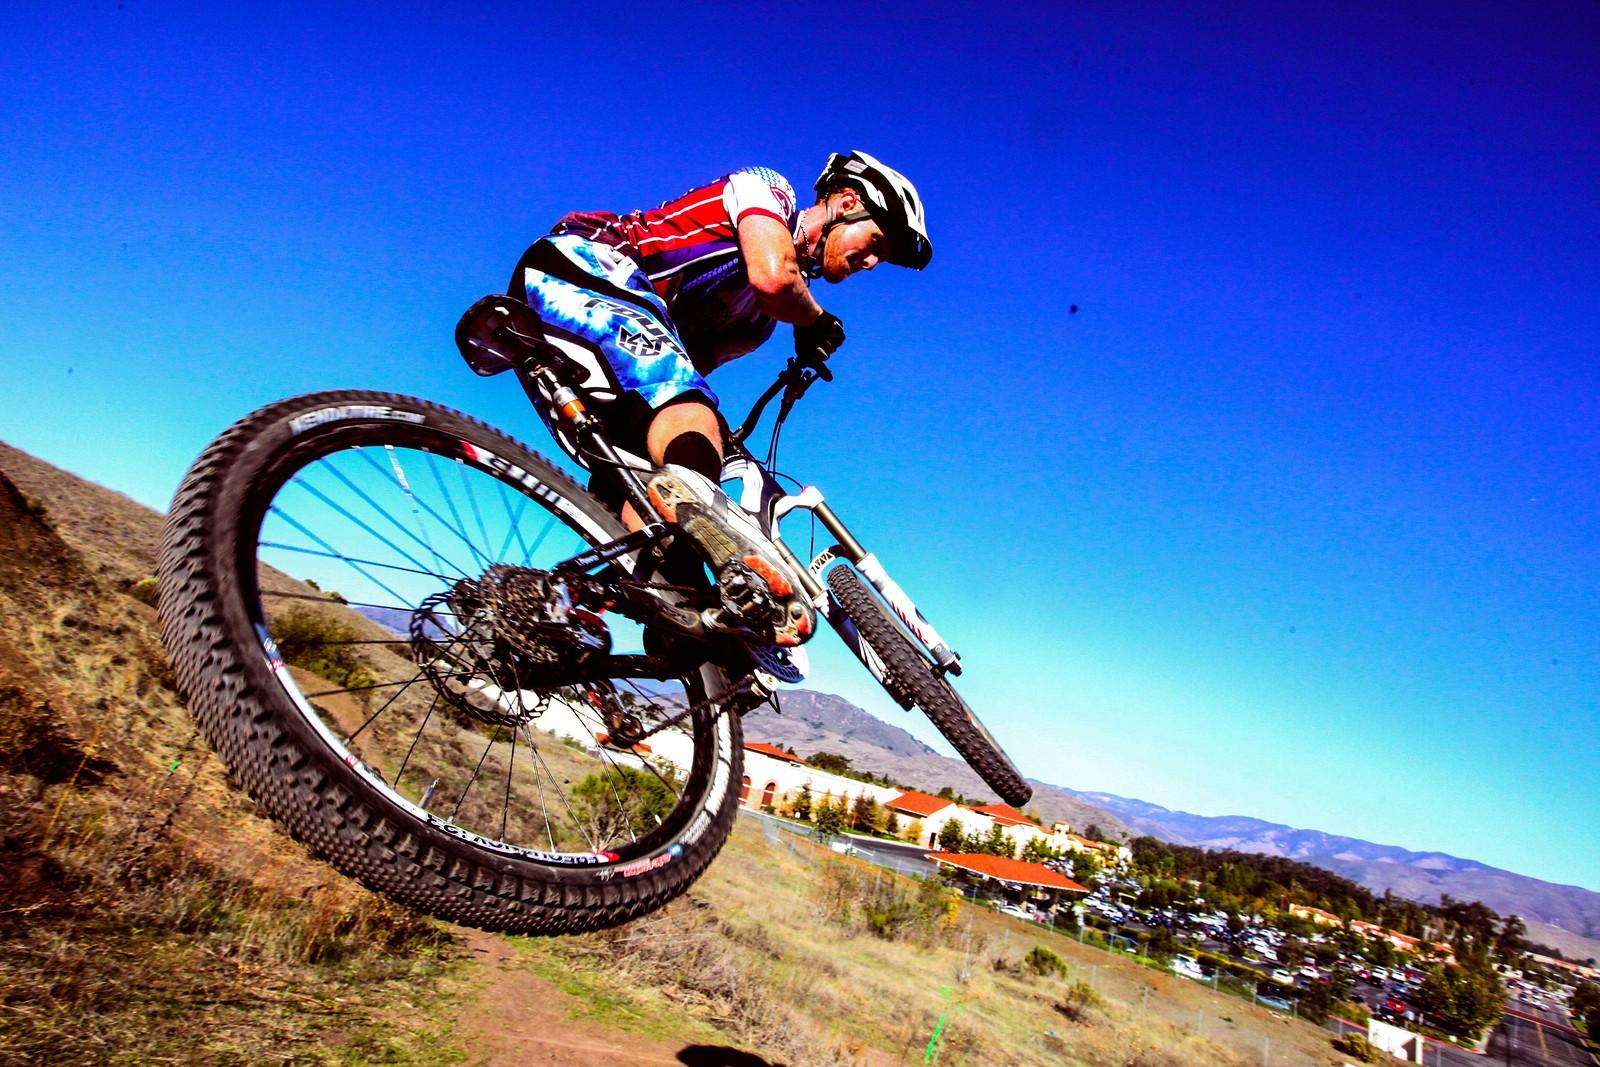 Tom Whip - GnarHuck - Mountain Biking Pictures - Vital MTB